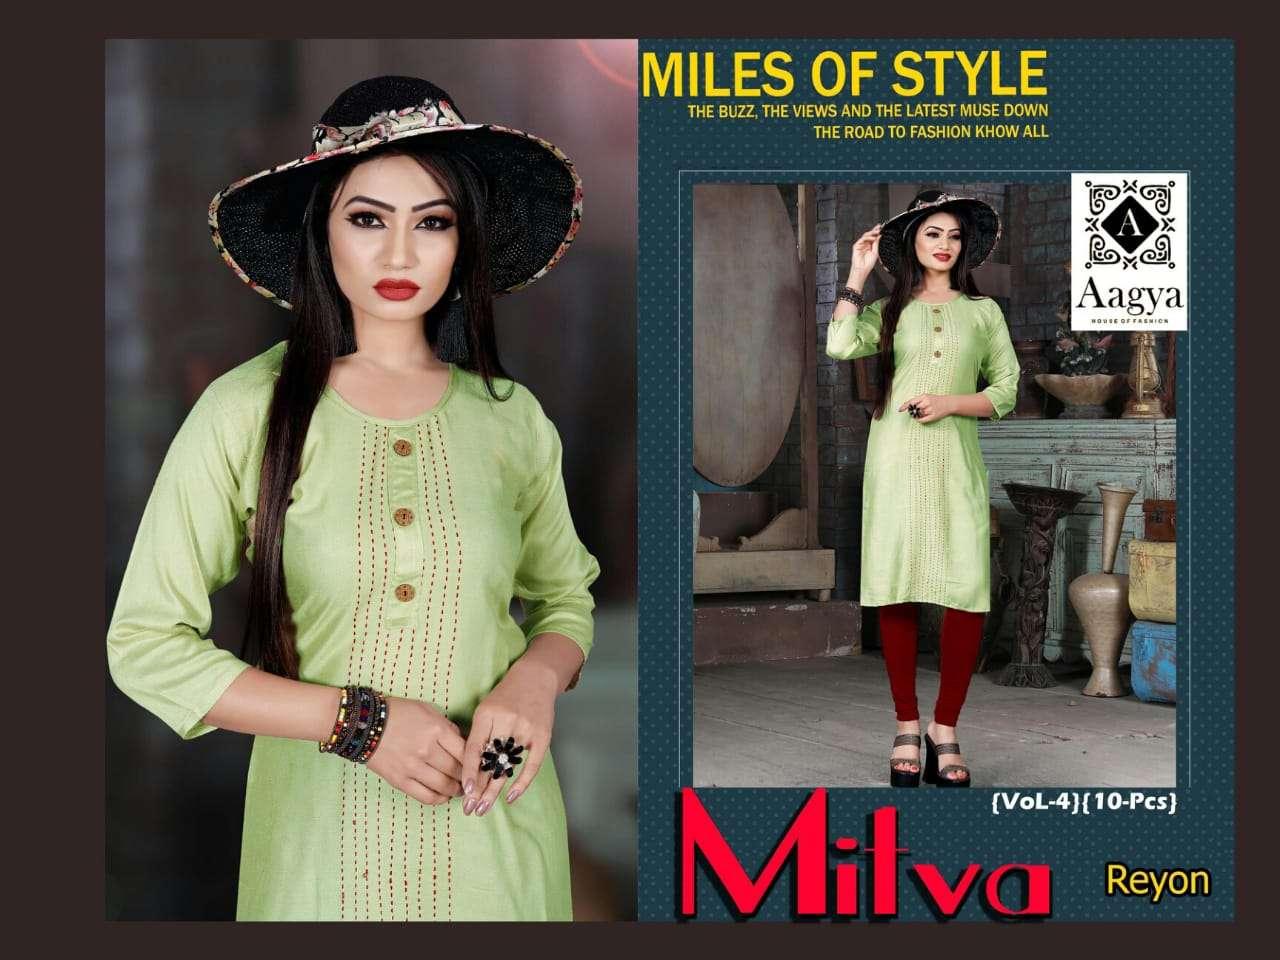 Mitva vol.4 by aagya heavy rayon Catalog Collection Wholesaler Lowest Best Price In Ahmedabad Surat Chennai India Uk Usa Malaysia Singapore Canada Australia